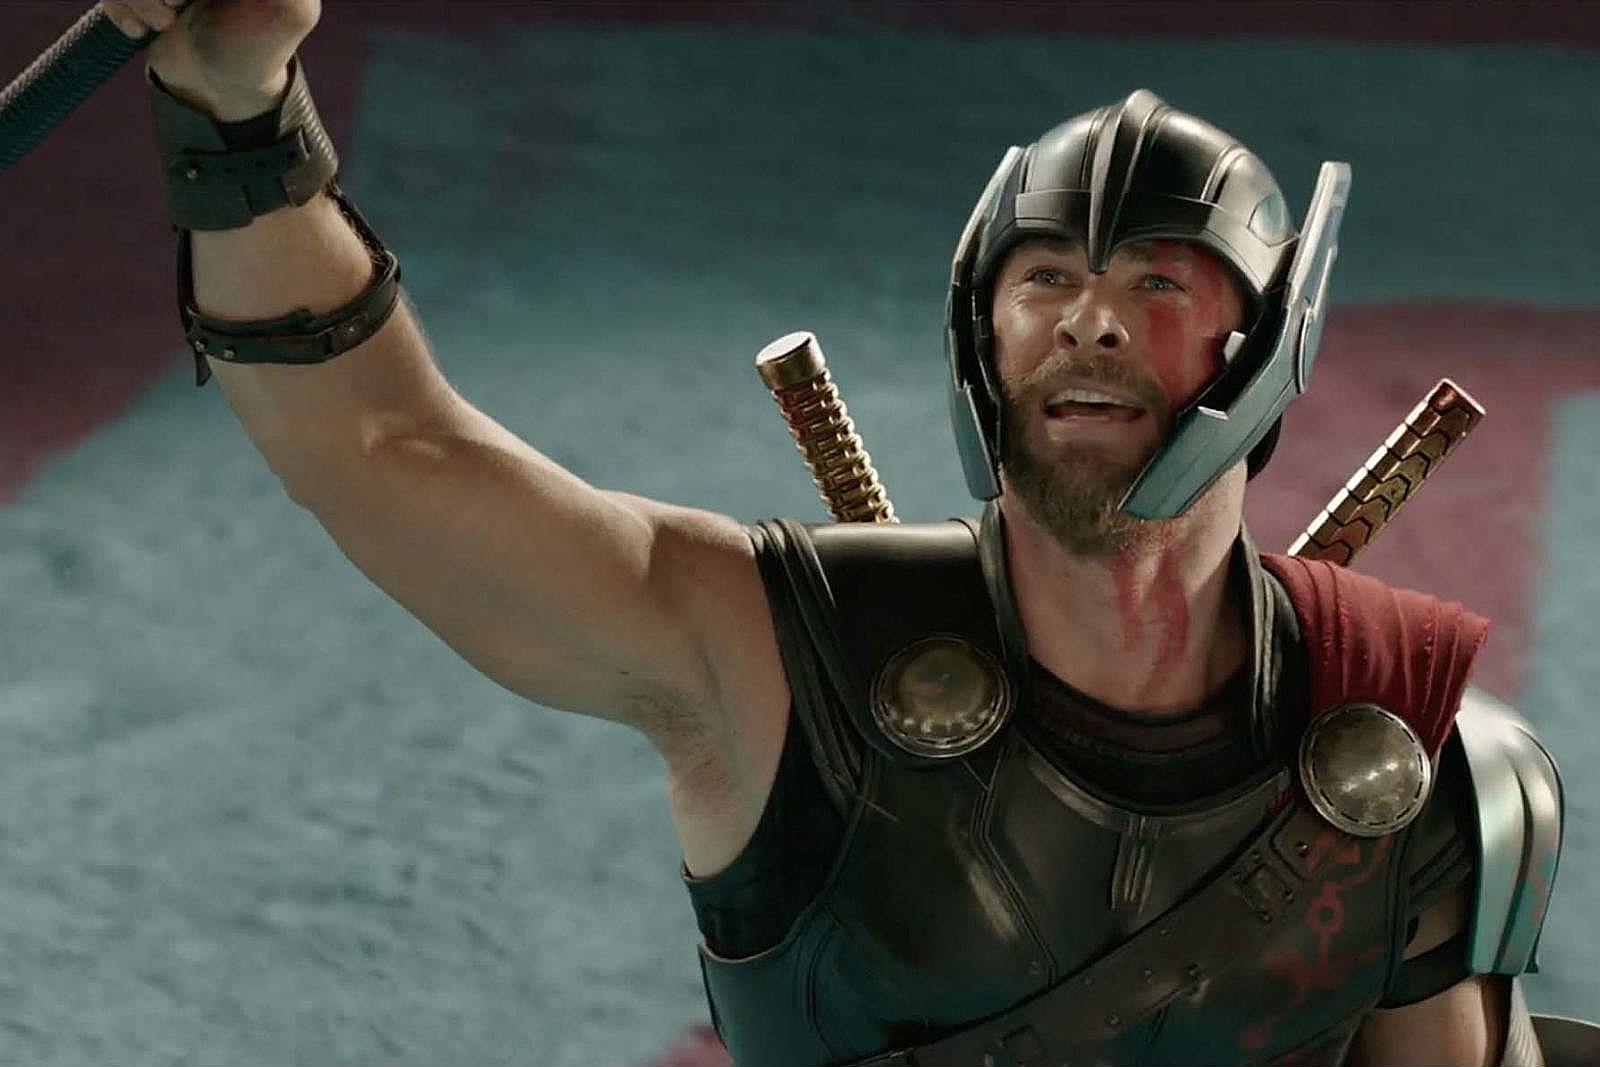 Thor Dildo Fuck Tube Movies Hard Solo Films